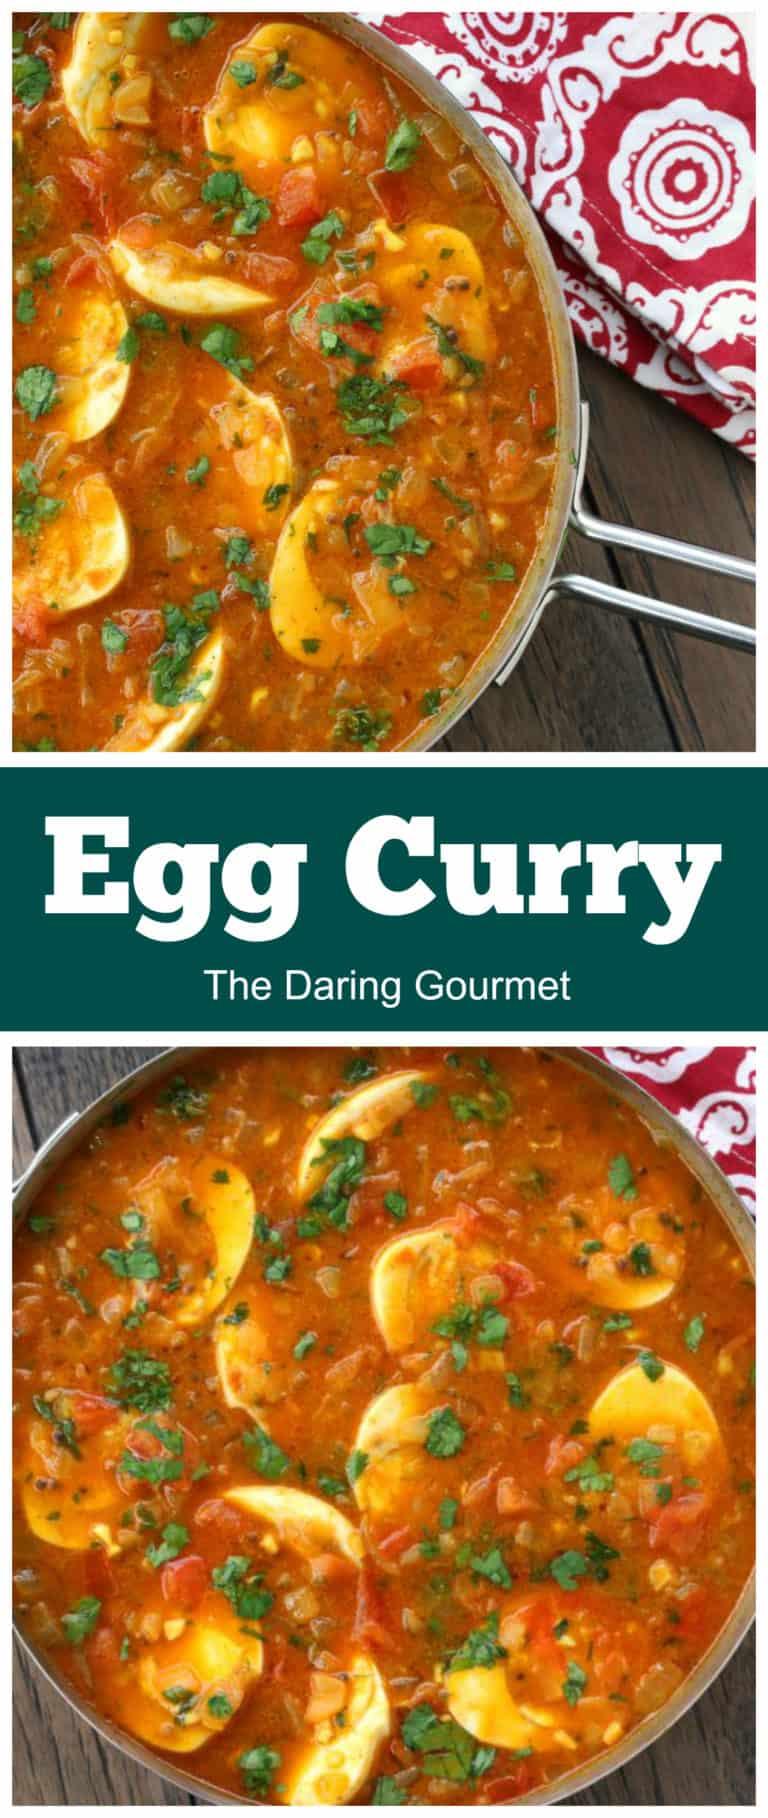 egg curry recipe best Indian vegetarian vegan gluten free baida